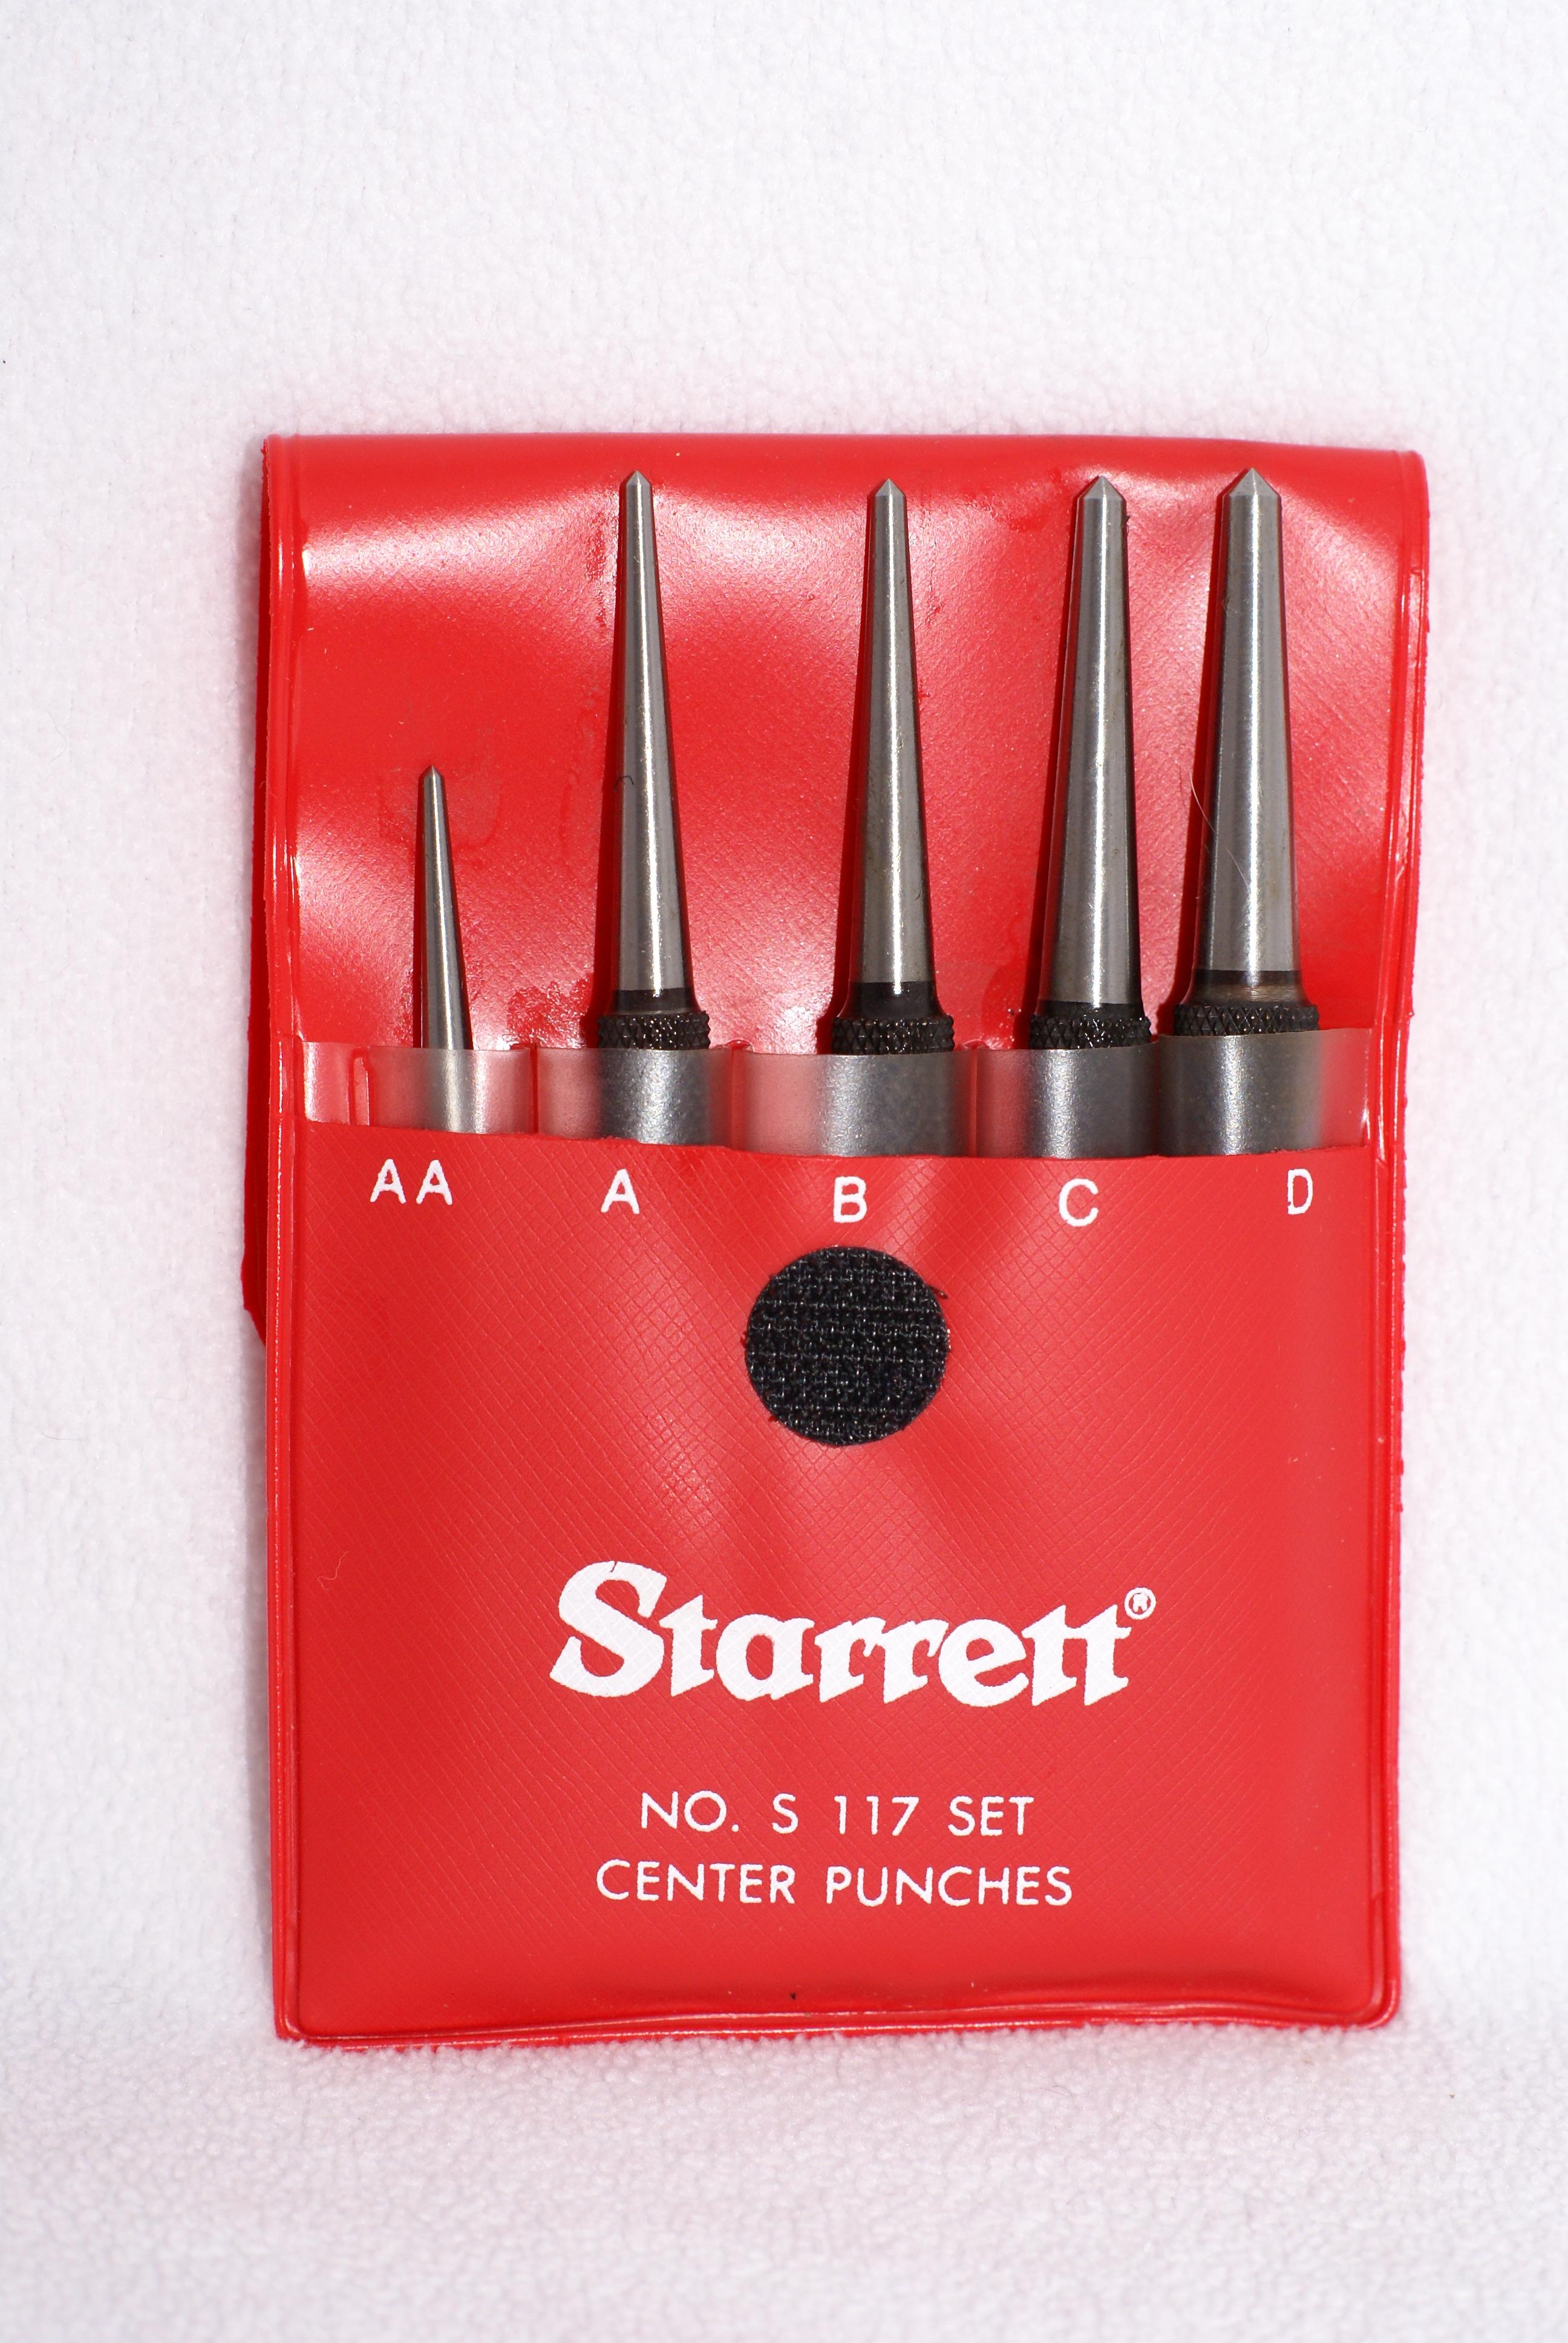 Starrett tool dating